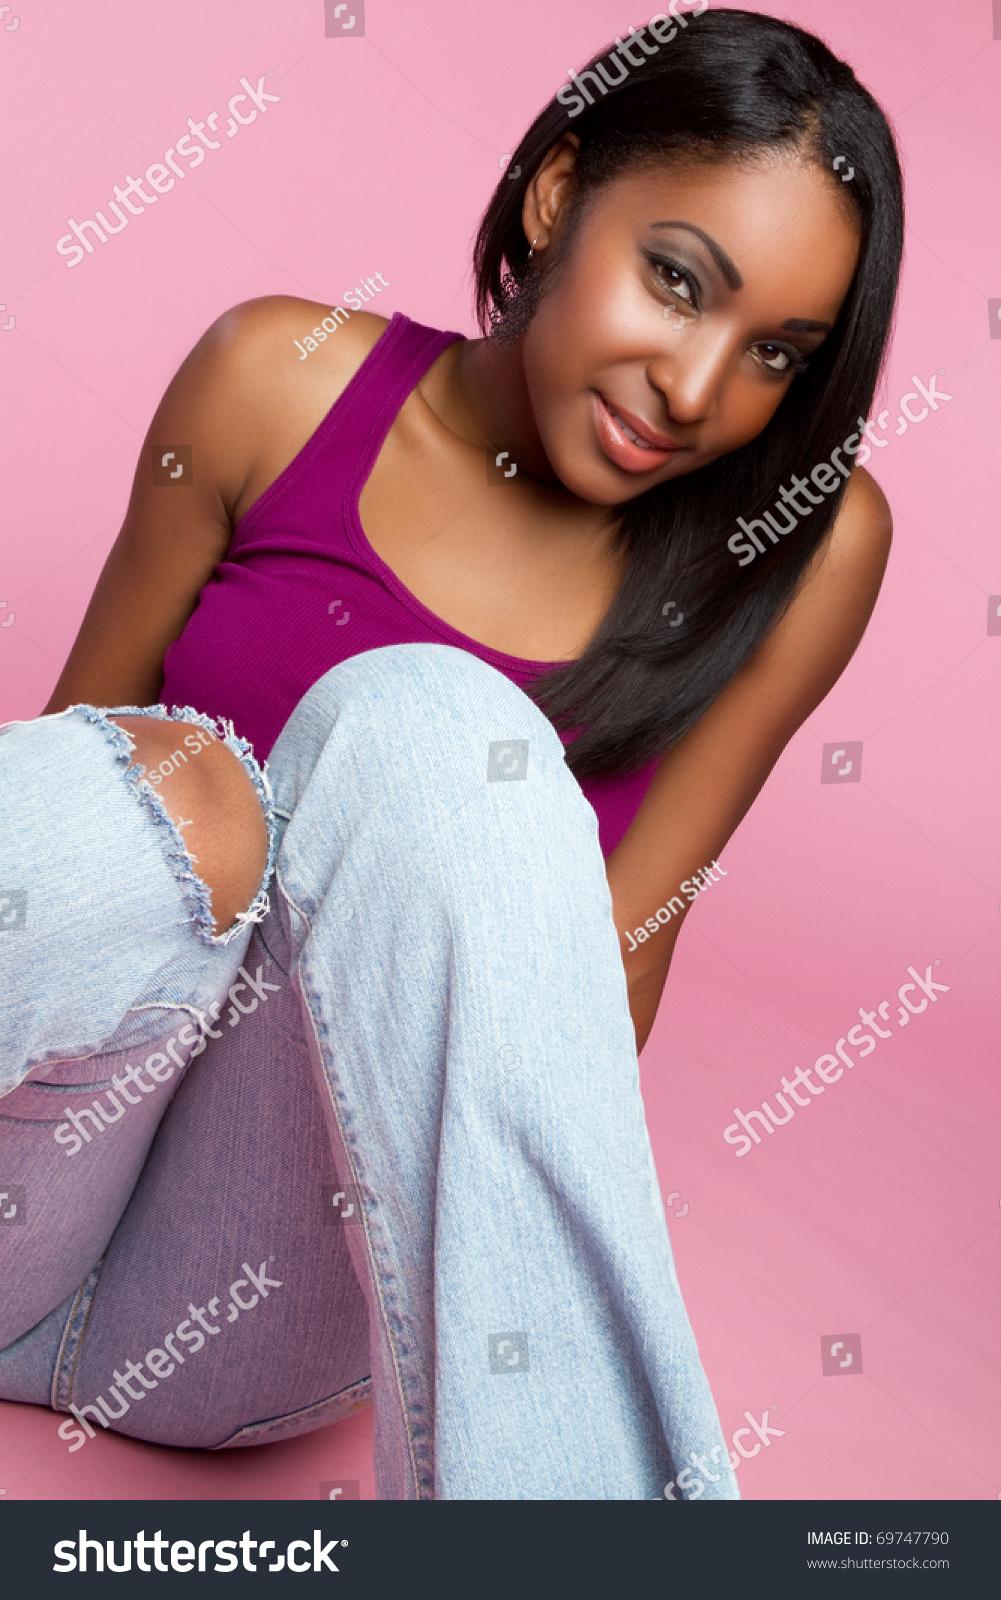 Beautiful Smiling Black Teen Girl Stock Photo 69747790